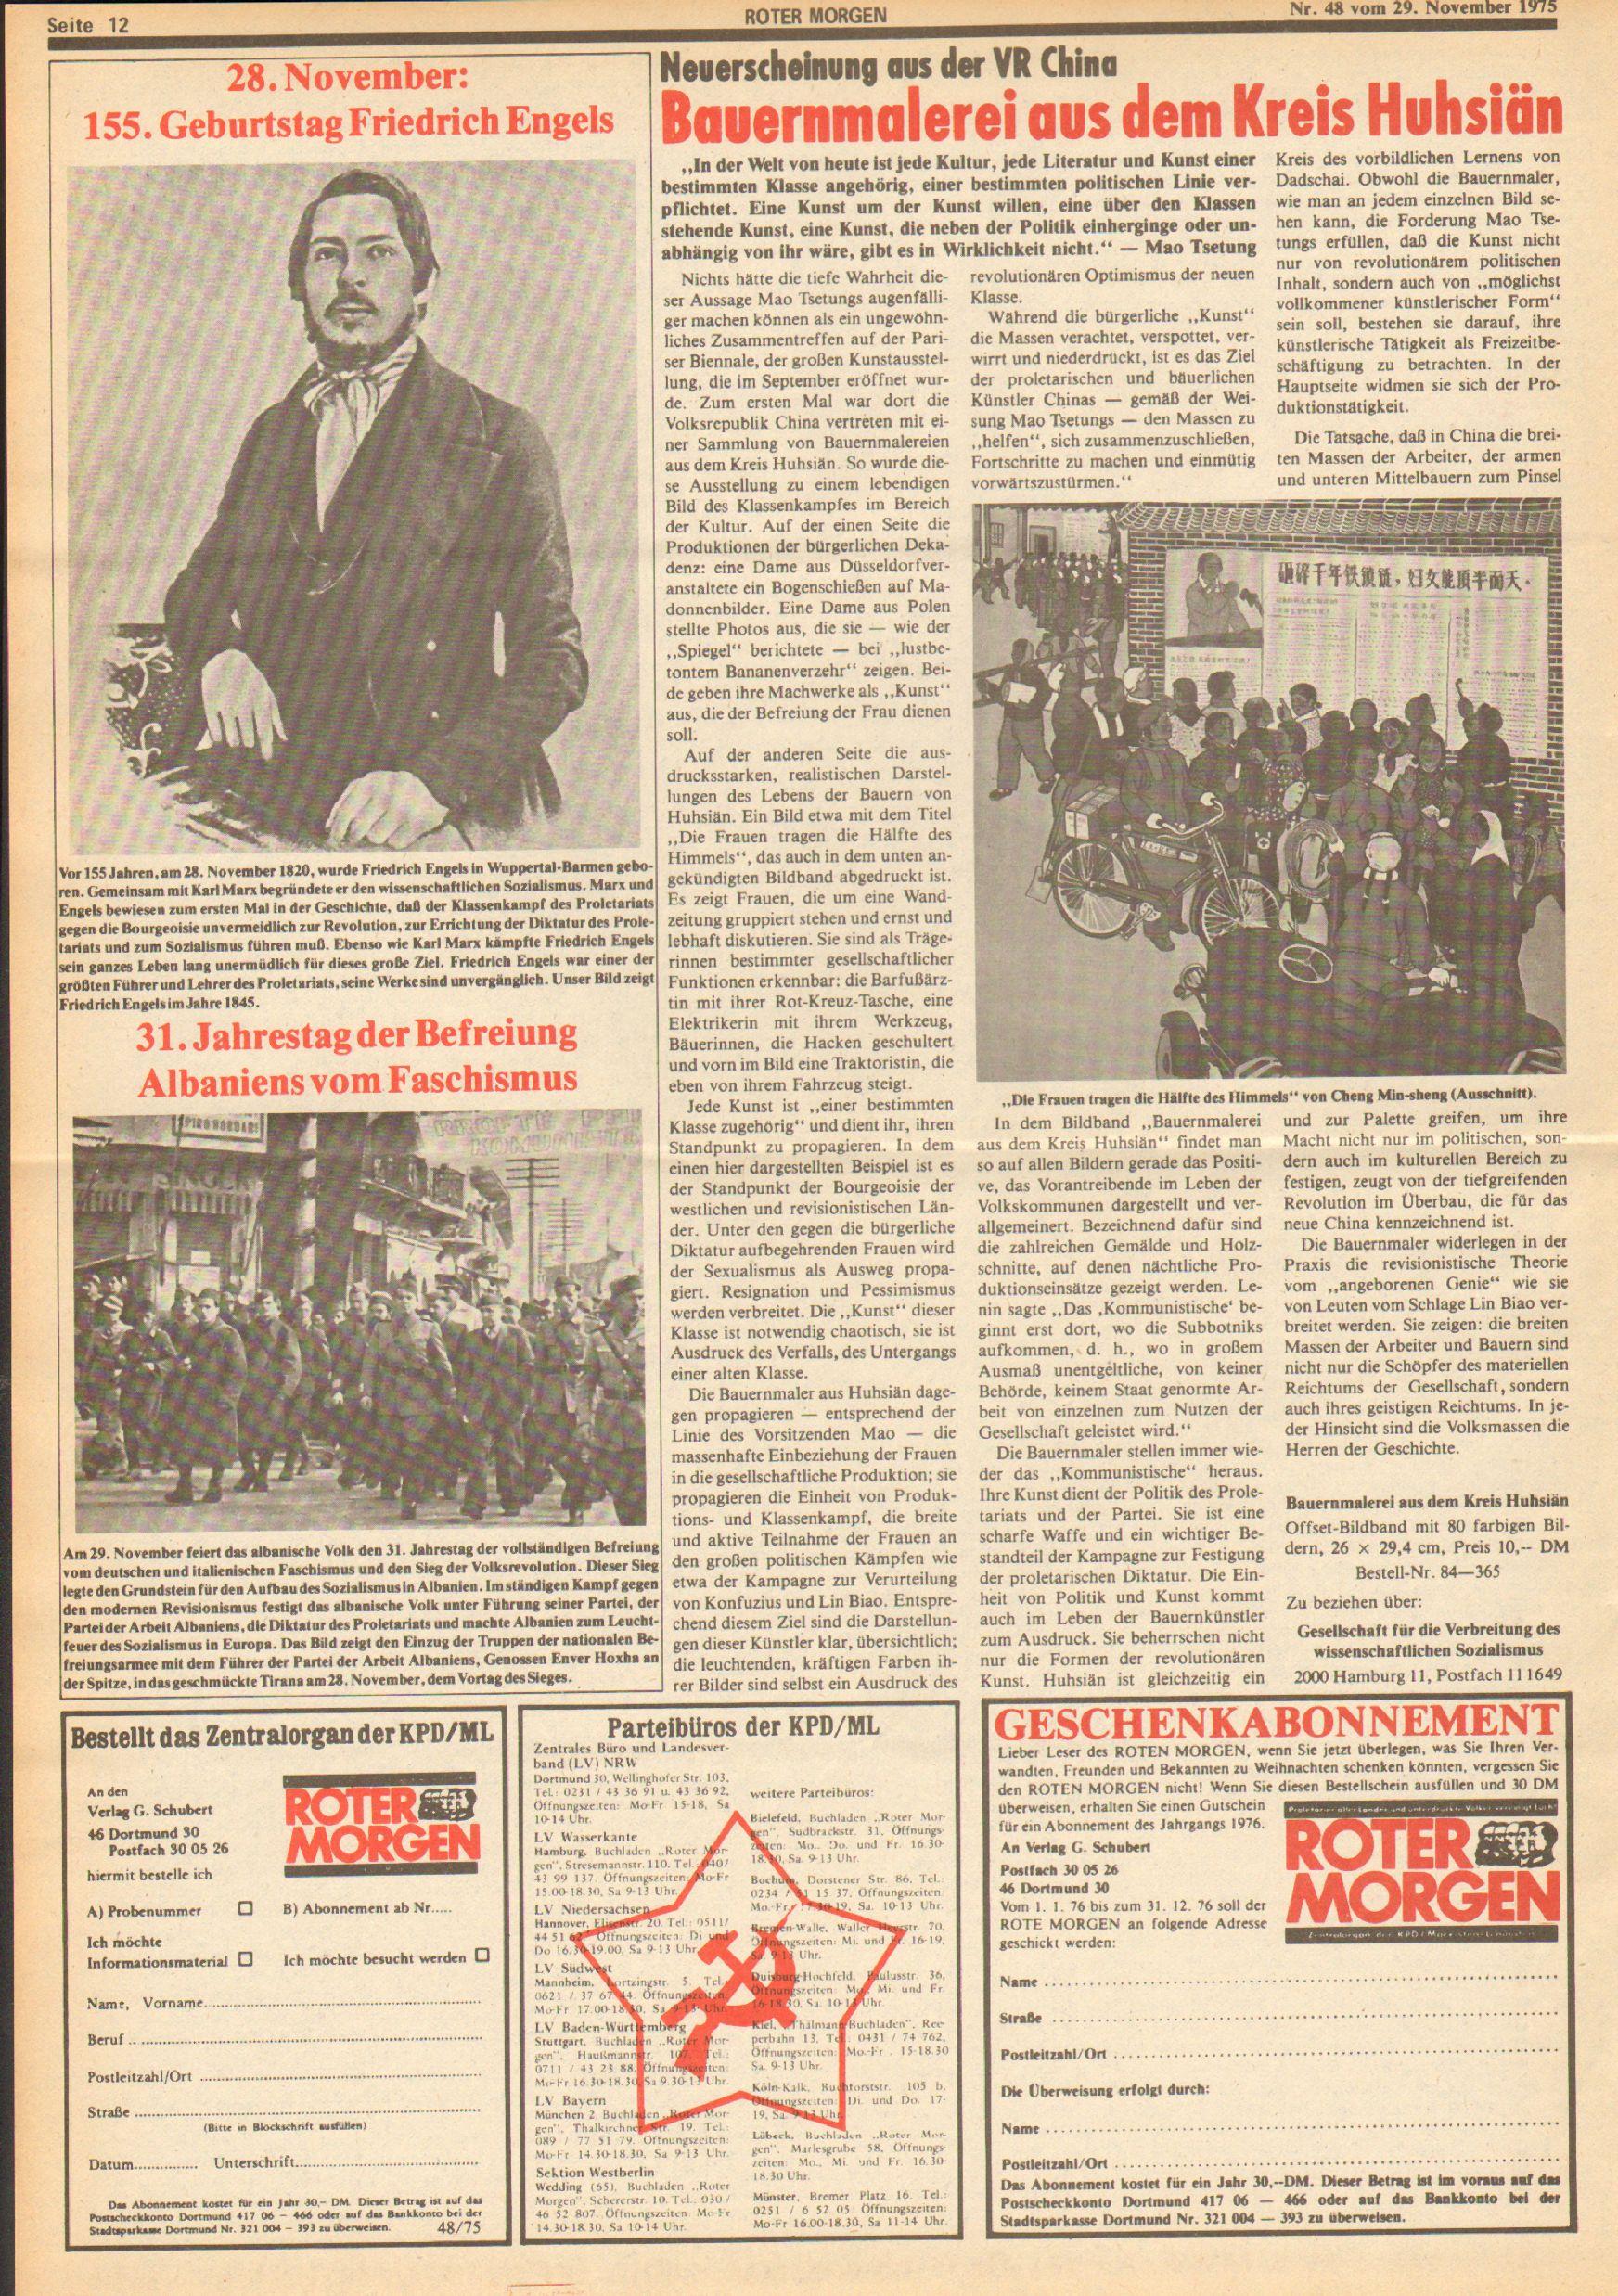 Roter Morgen, 9. Jg., 29. November 1975, Nr. 48, Seite 12